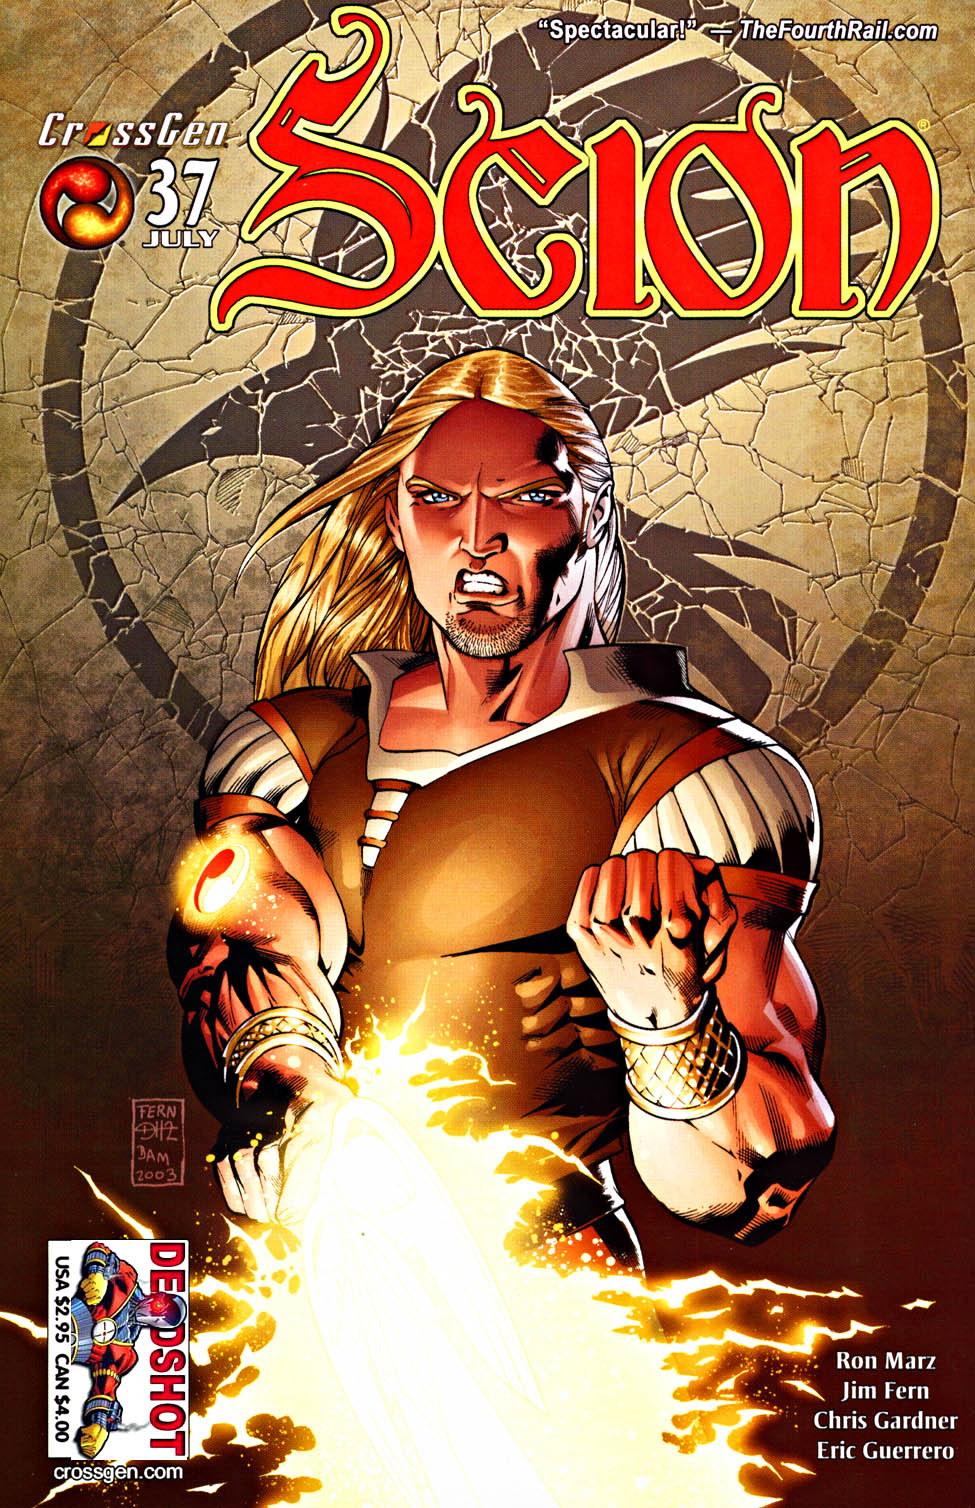 Read online Scion comic -  Issue #37 - 1